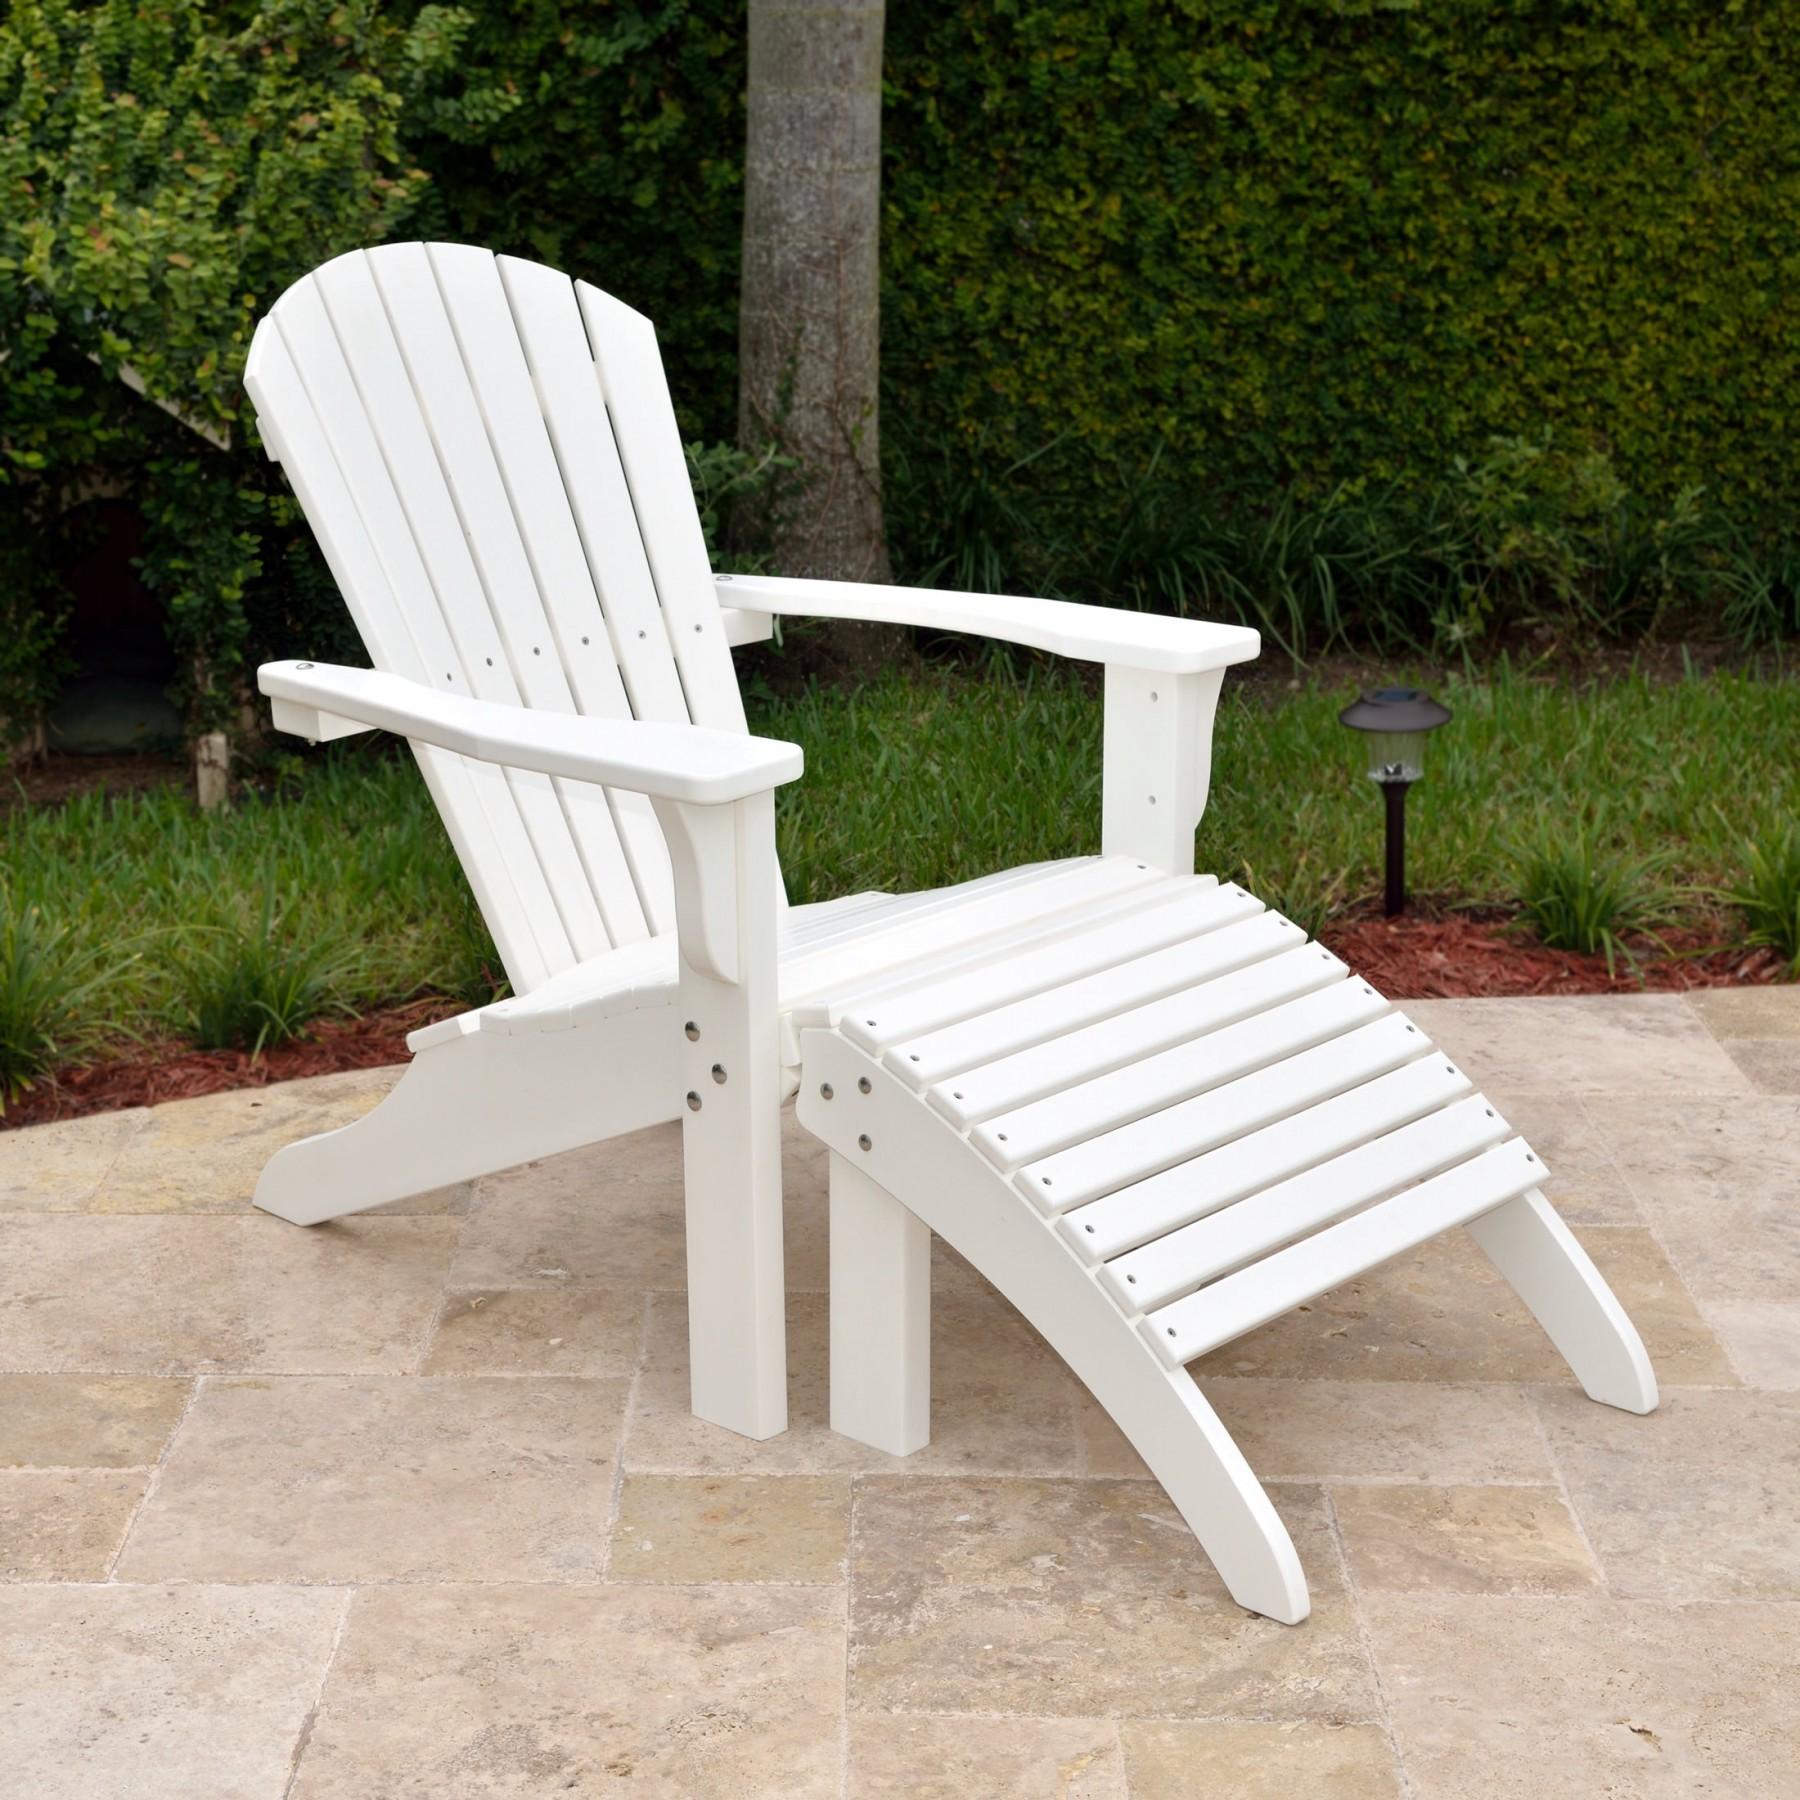 Loggerhead Original Adirondack Chair